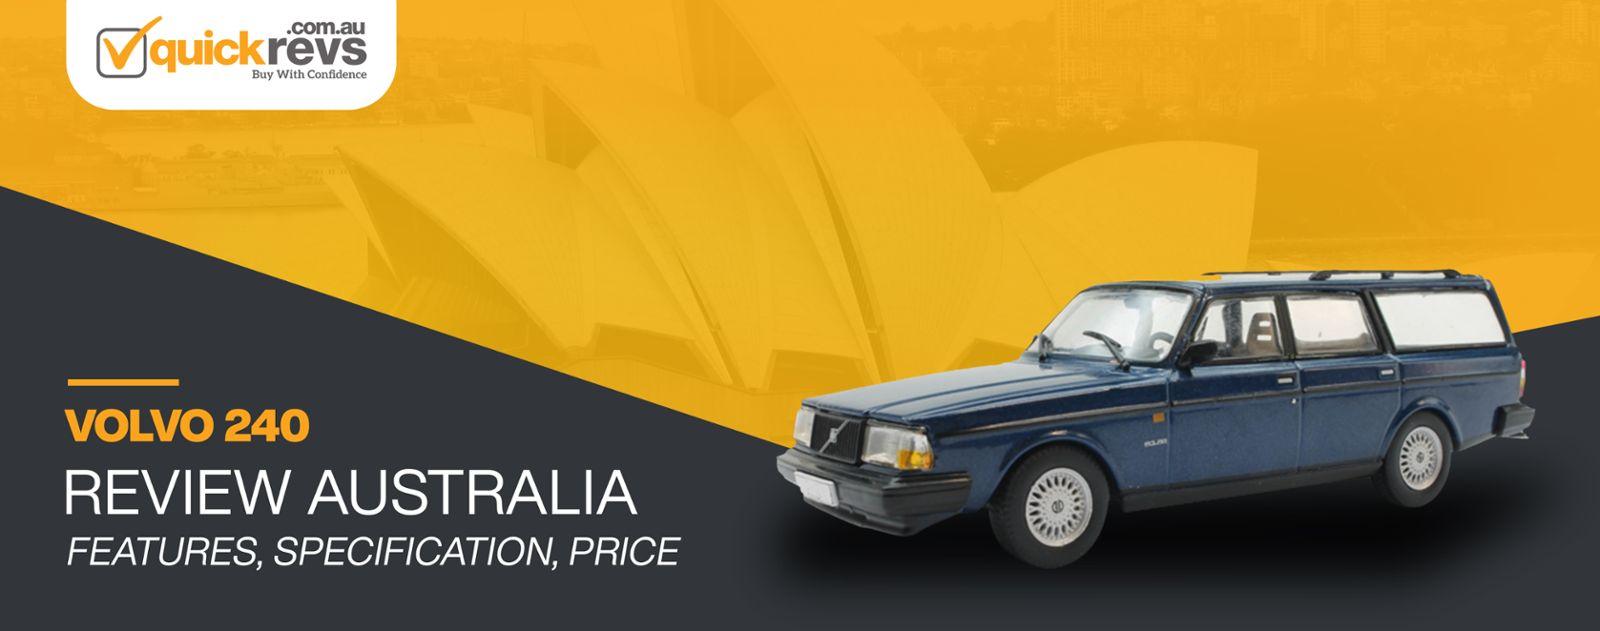 Volvo 240 Review Australia